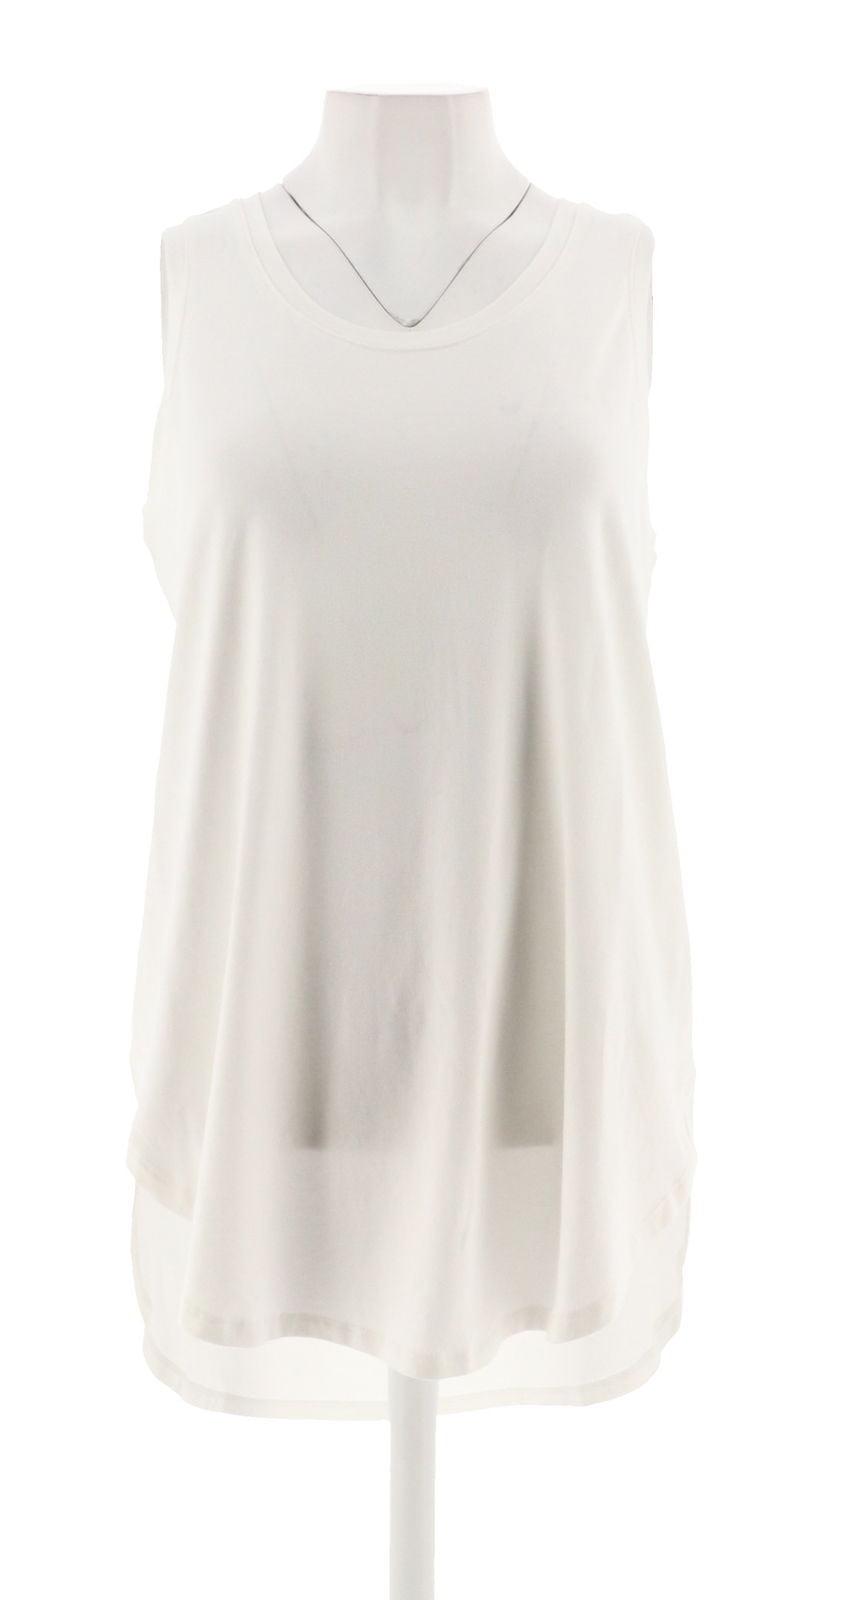 AnyBody Loungewear Cozy Knit Side Split Tank Top White XS NEW A306950